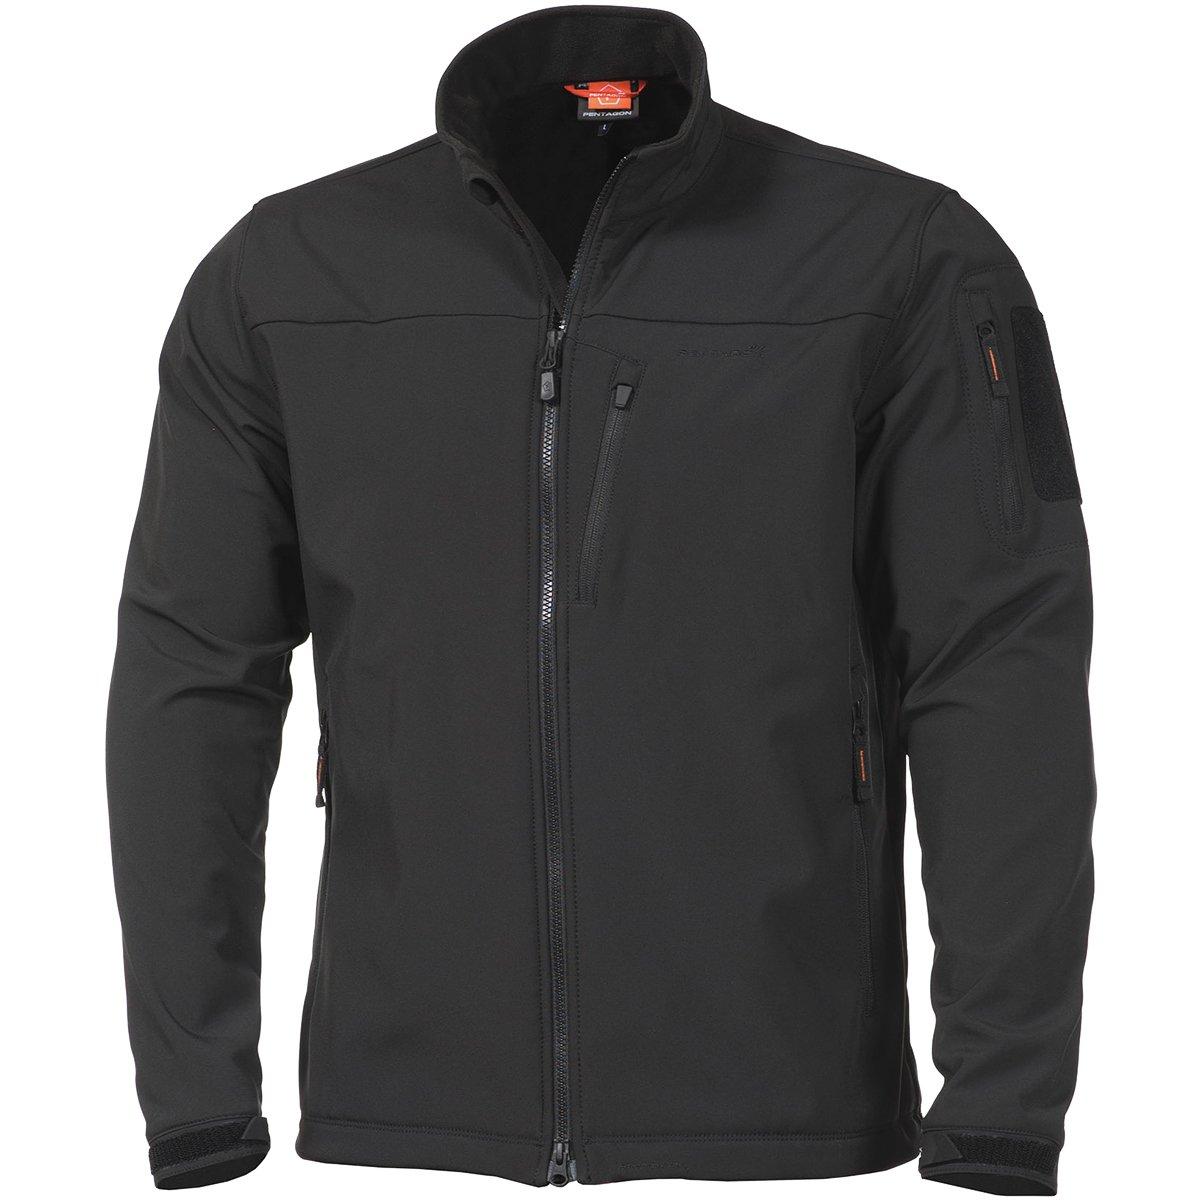 7d9ecde910a526 Pentagon Reiner 2.0 Men s Softshell Jacket Black at Amazon Men s Clothing  store